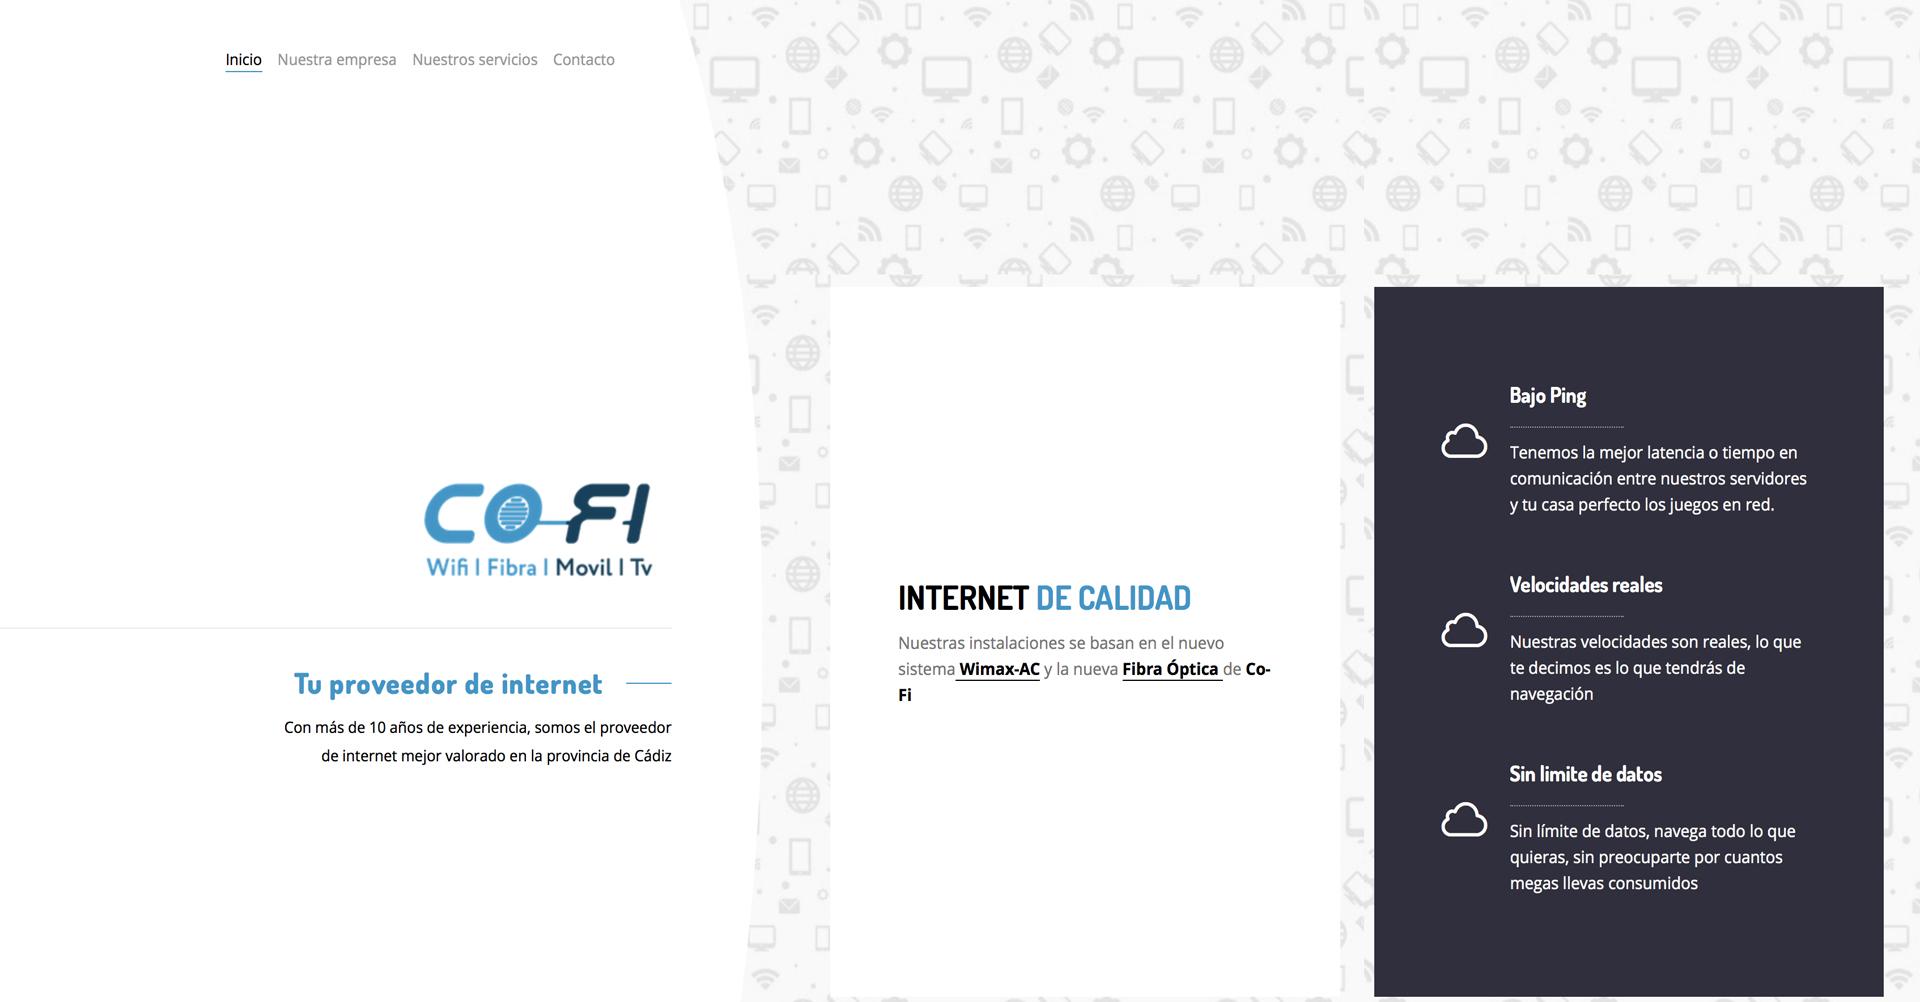 Co-fi | Web